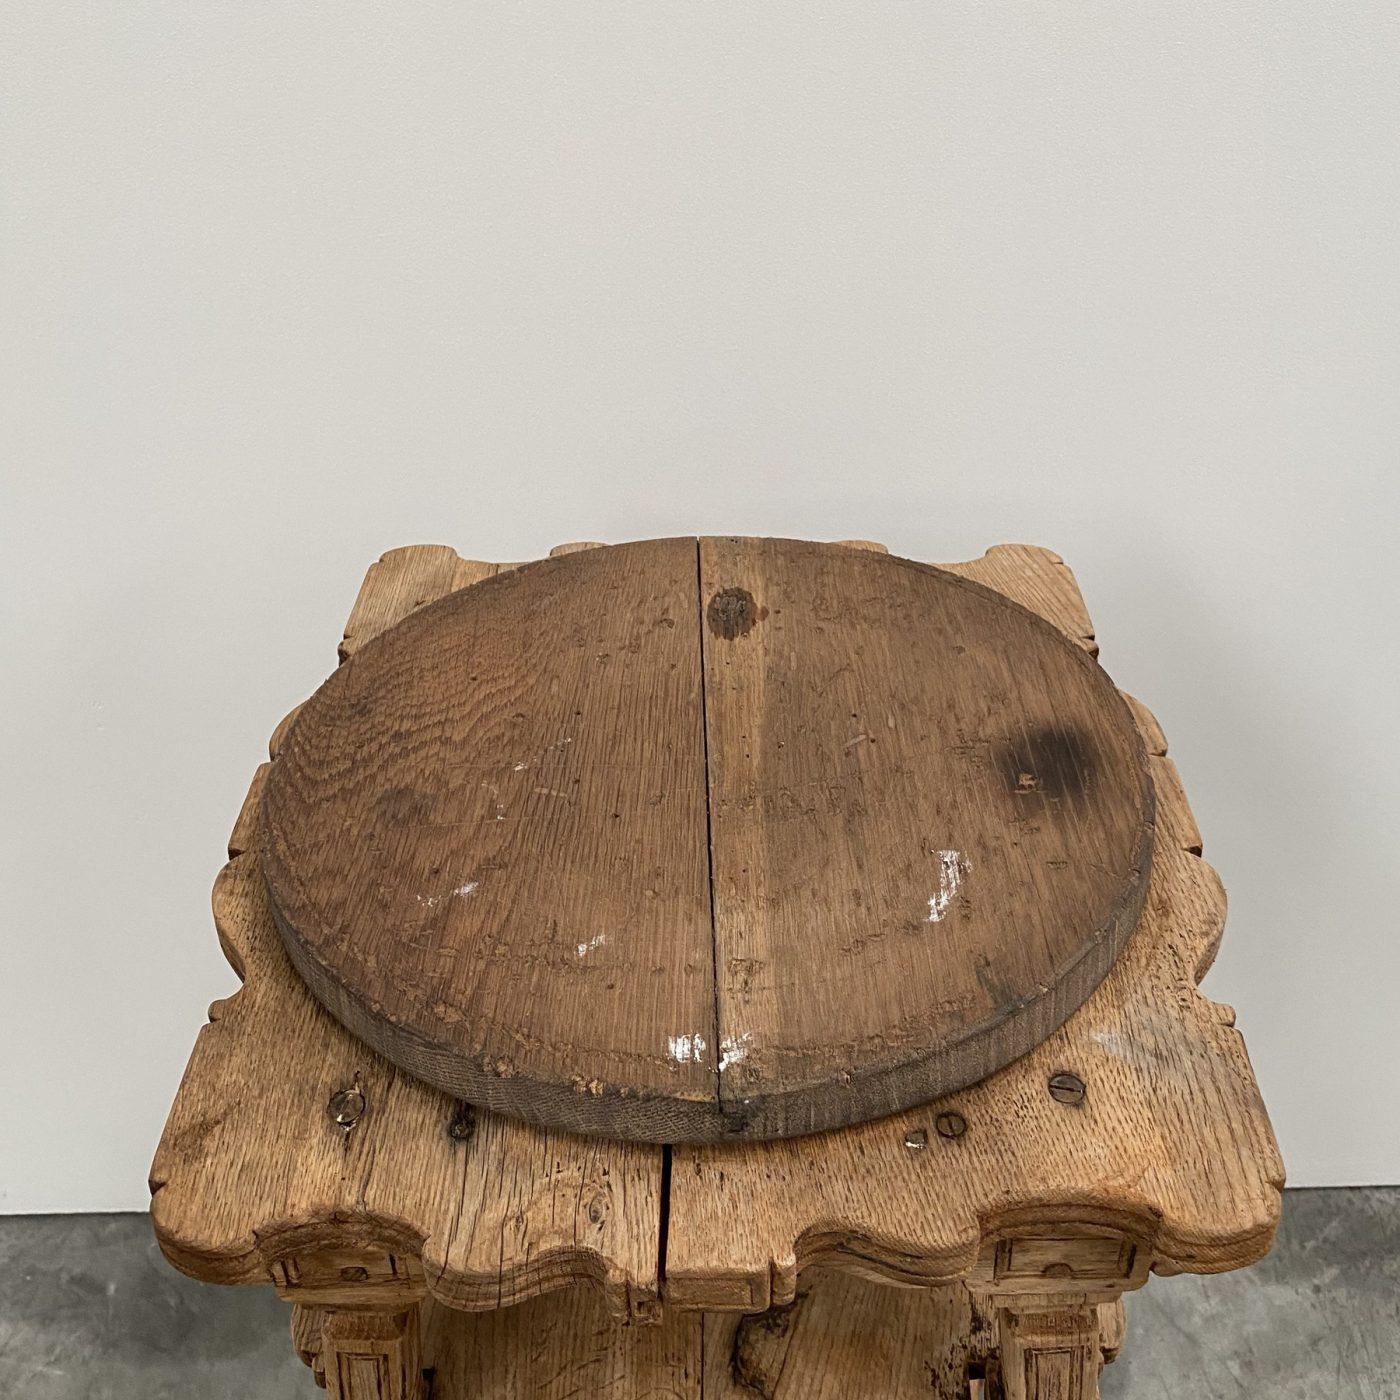 objet-vagabond-sculptor-table0003